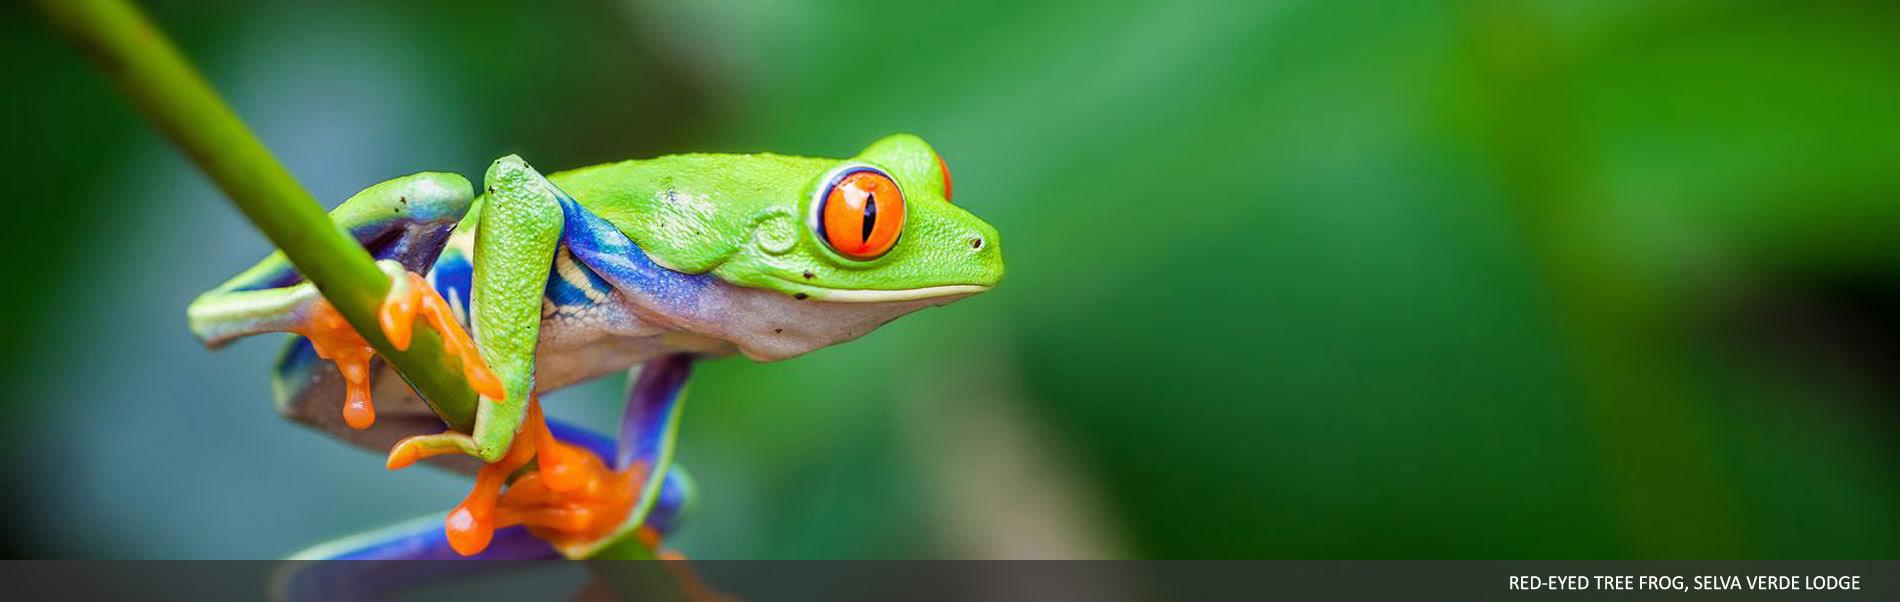 selvaverde-costarica-01.jpg